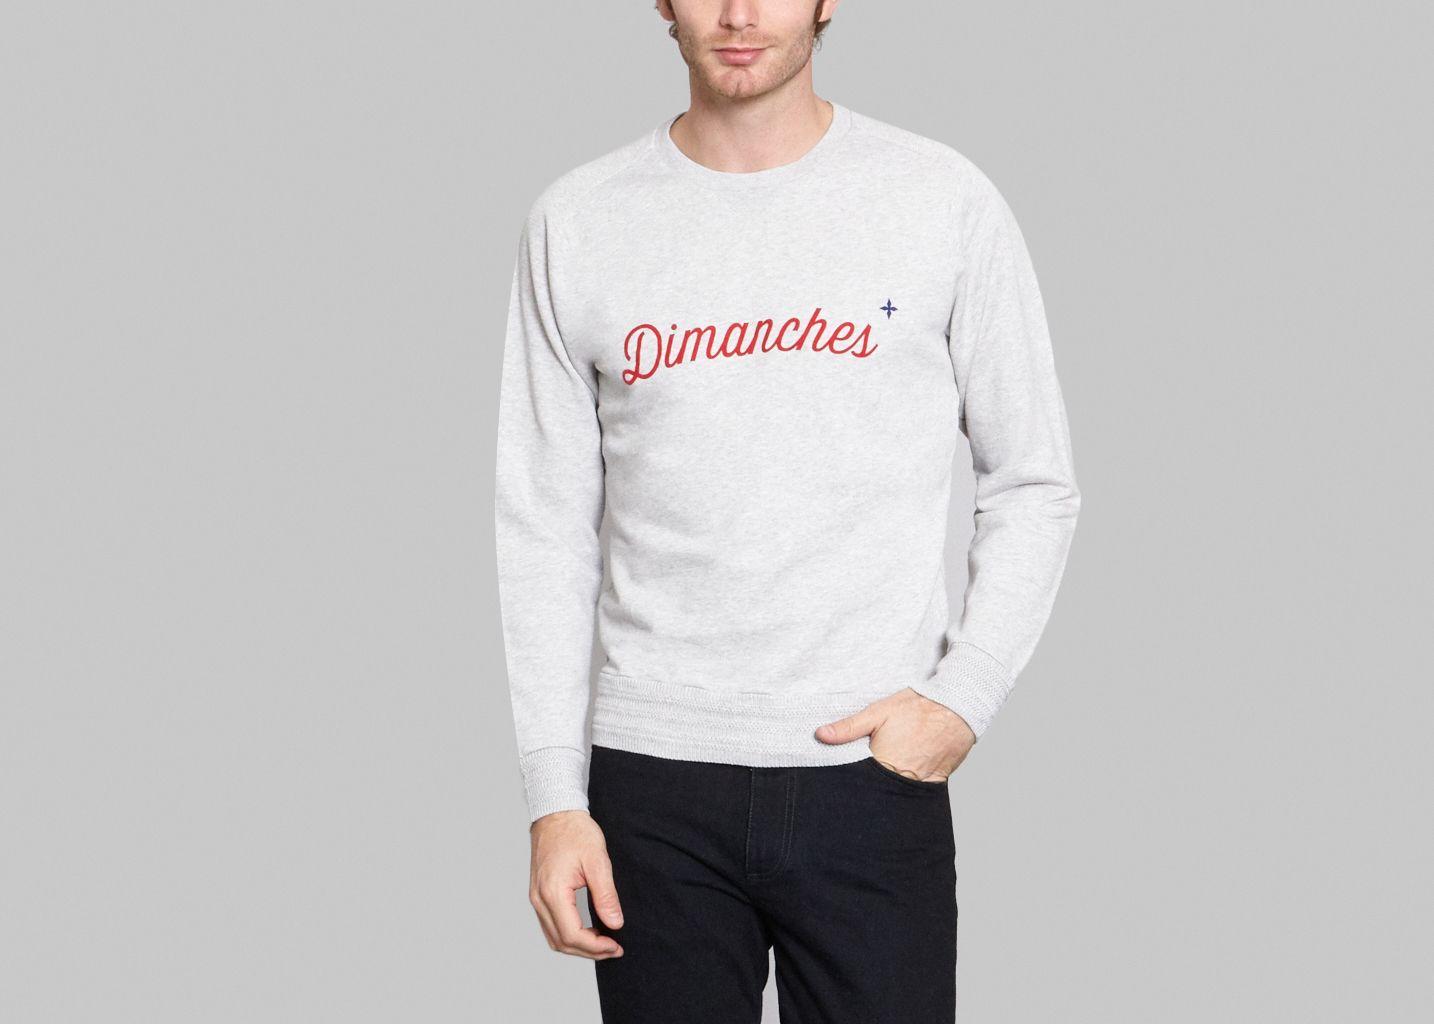 Sunday Sweatshirt - Commune de Paris